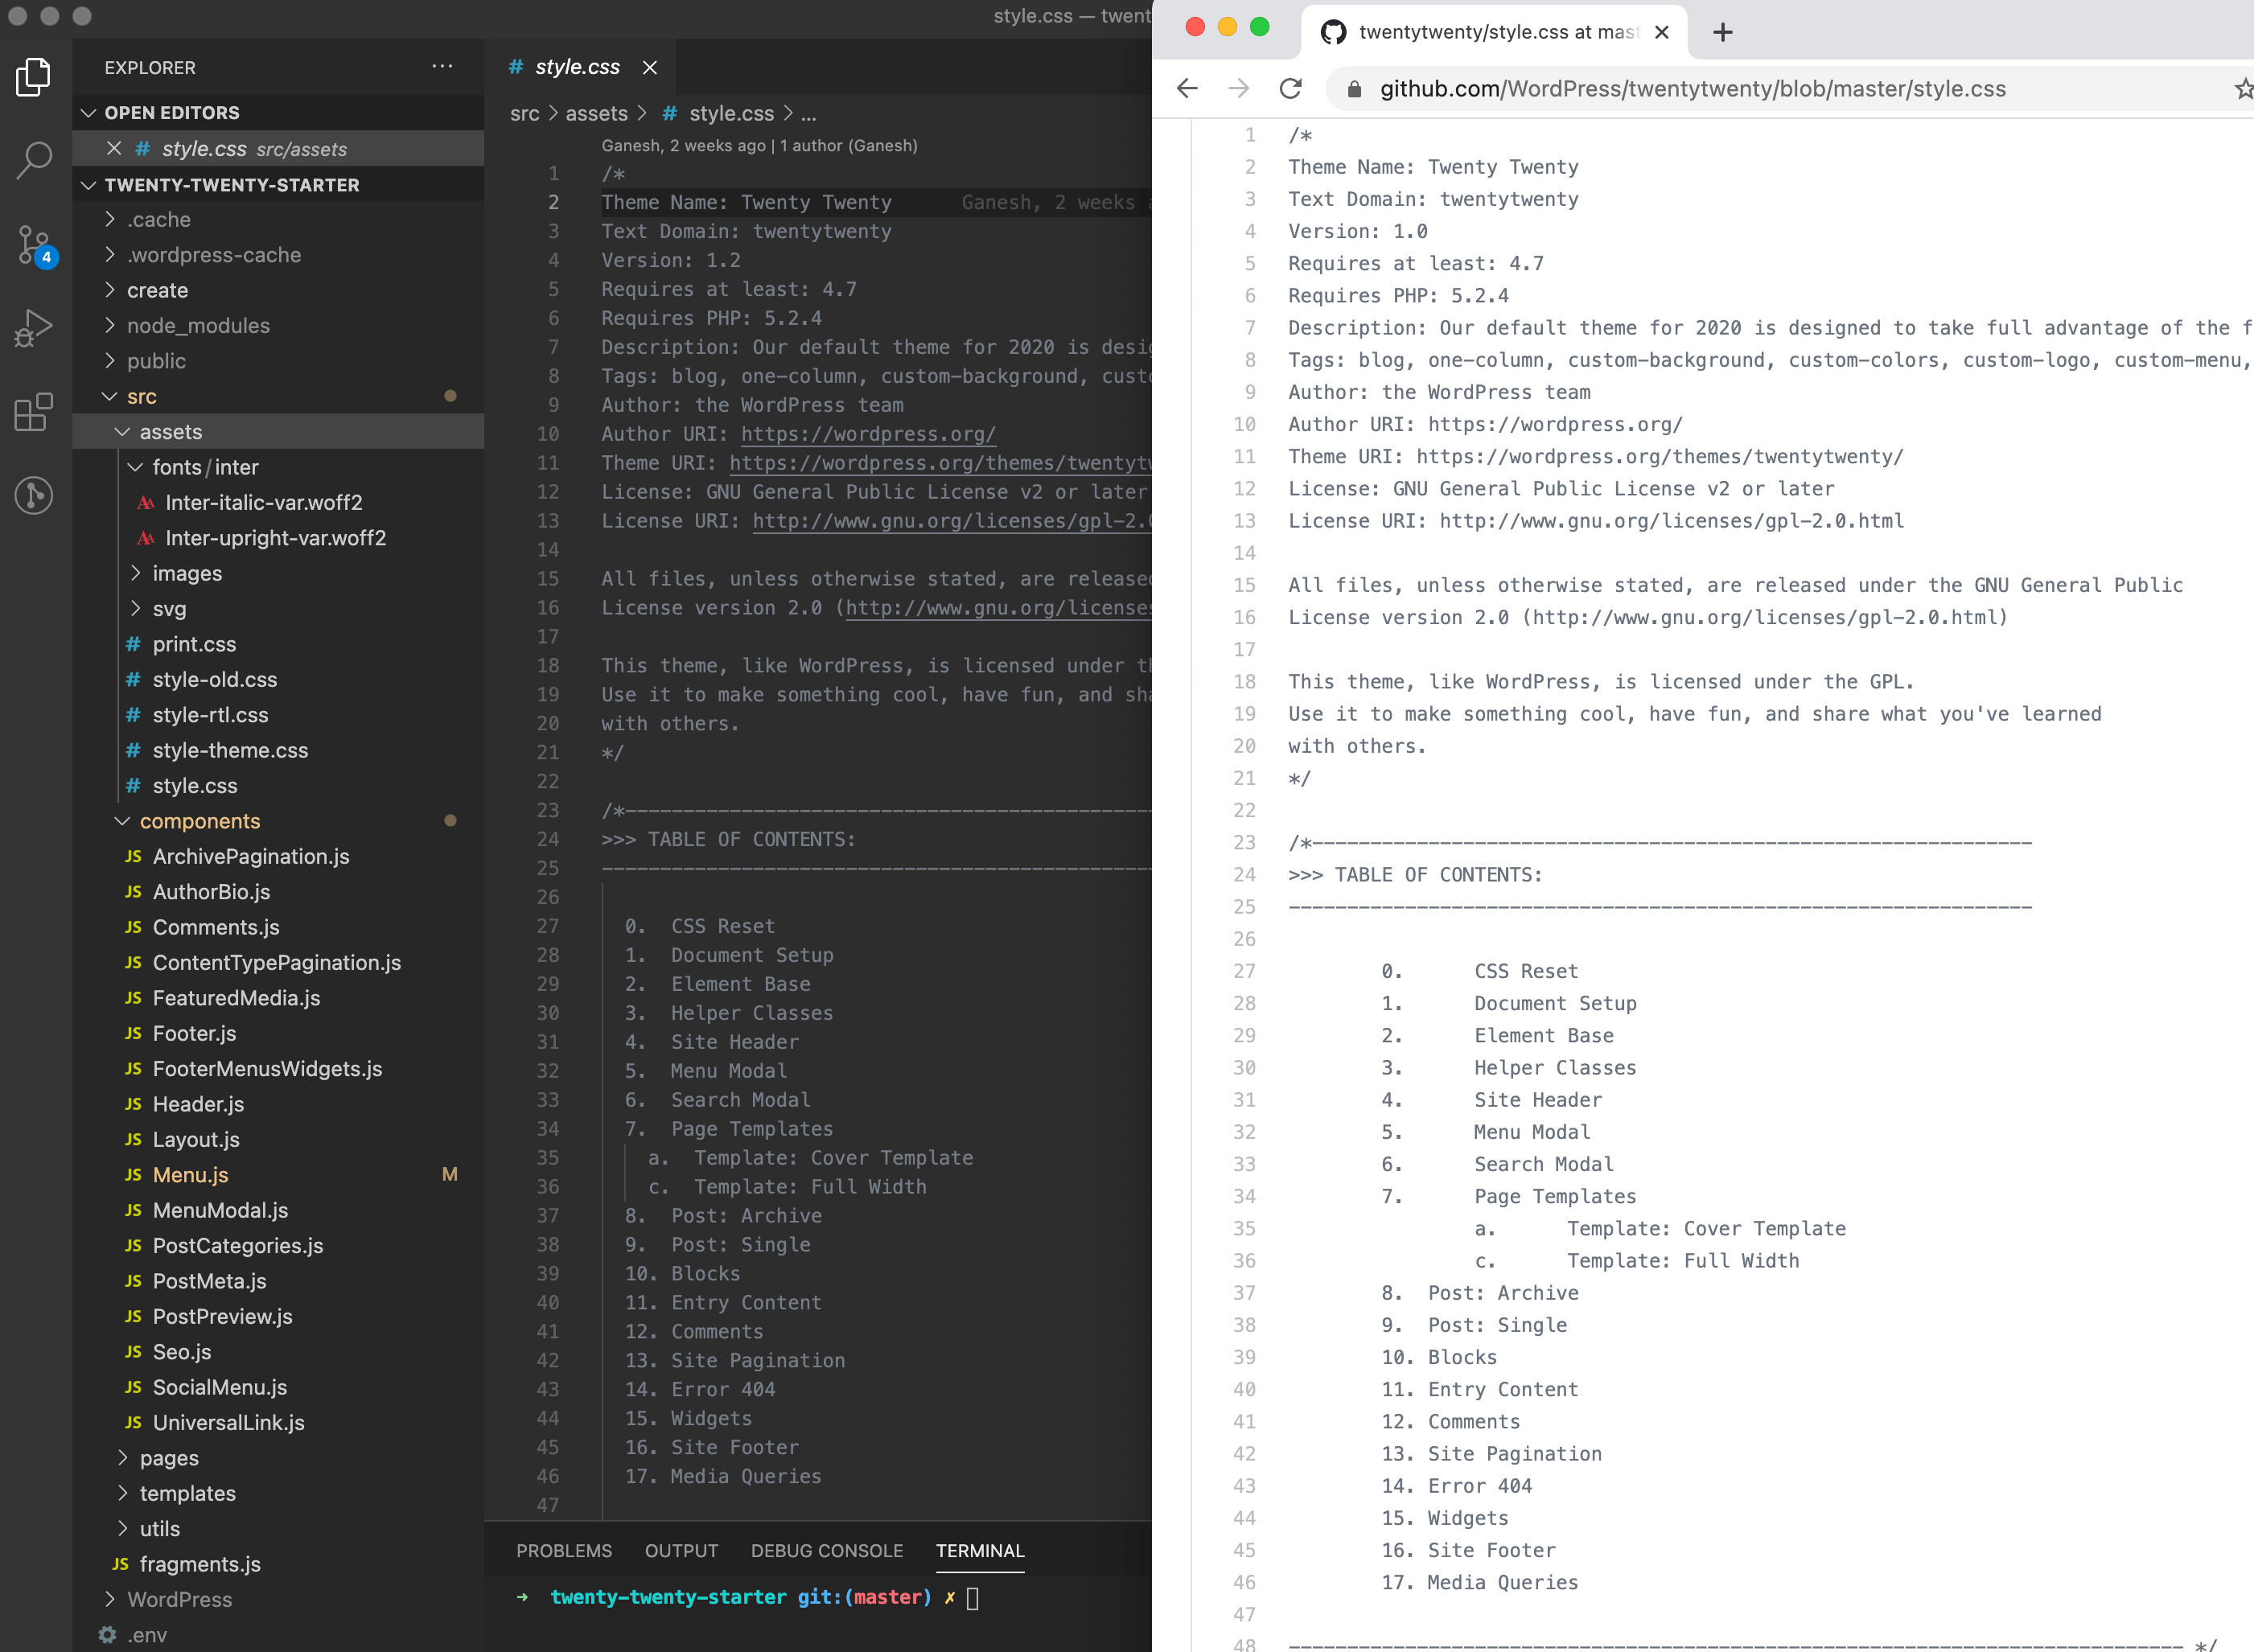 Screenshot showing the Gatsby StarterWordPress Twenty Twenty style.css file opened next to the WordPress Twenty Twenty theme's style.css file. The two contain the exact same code.